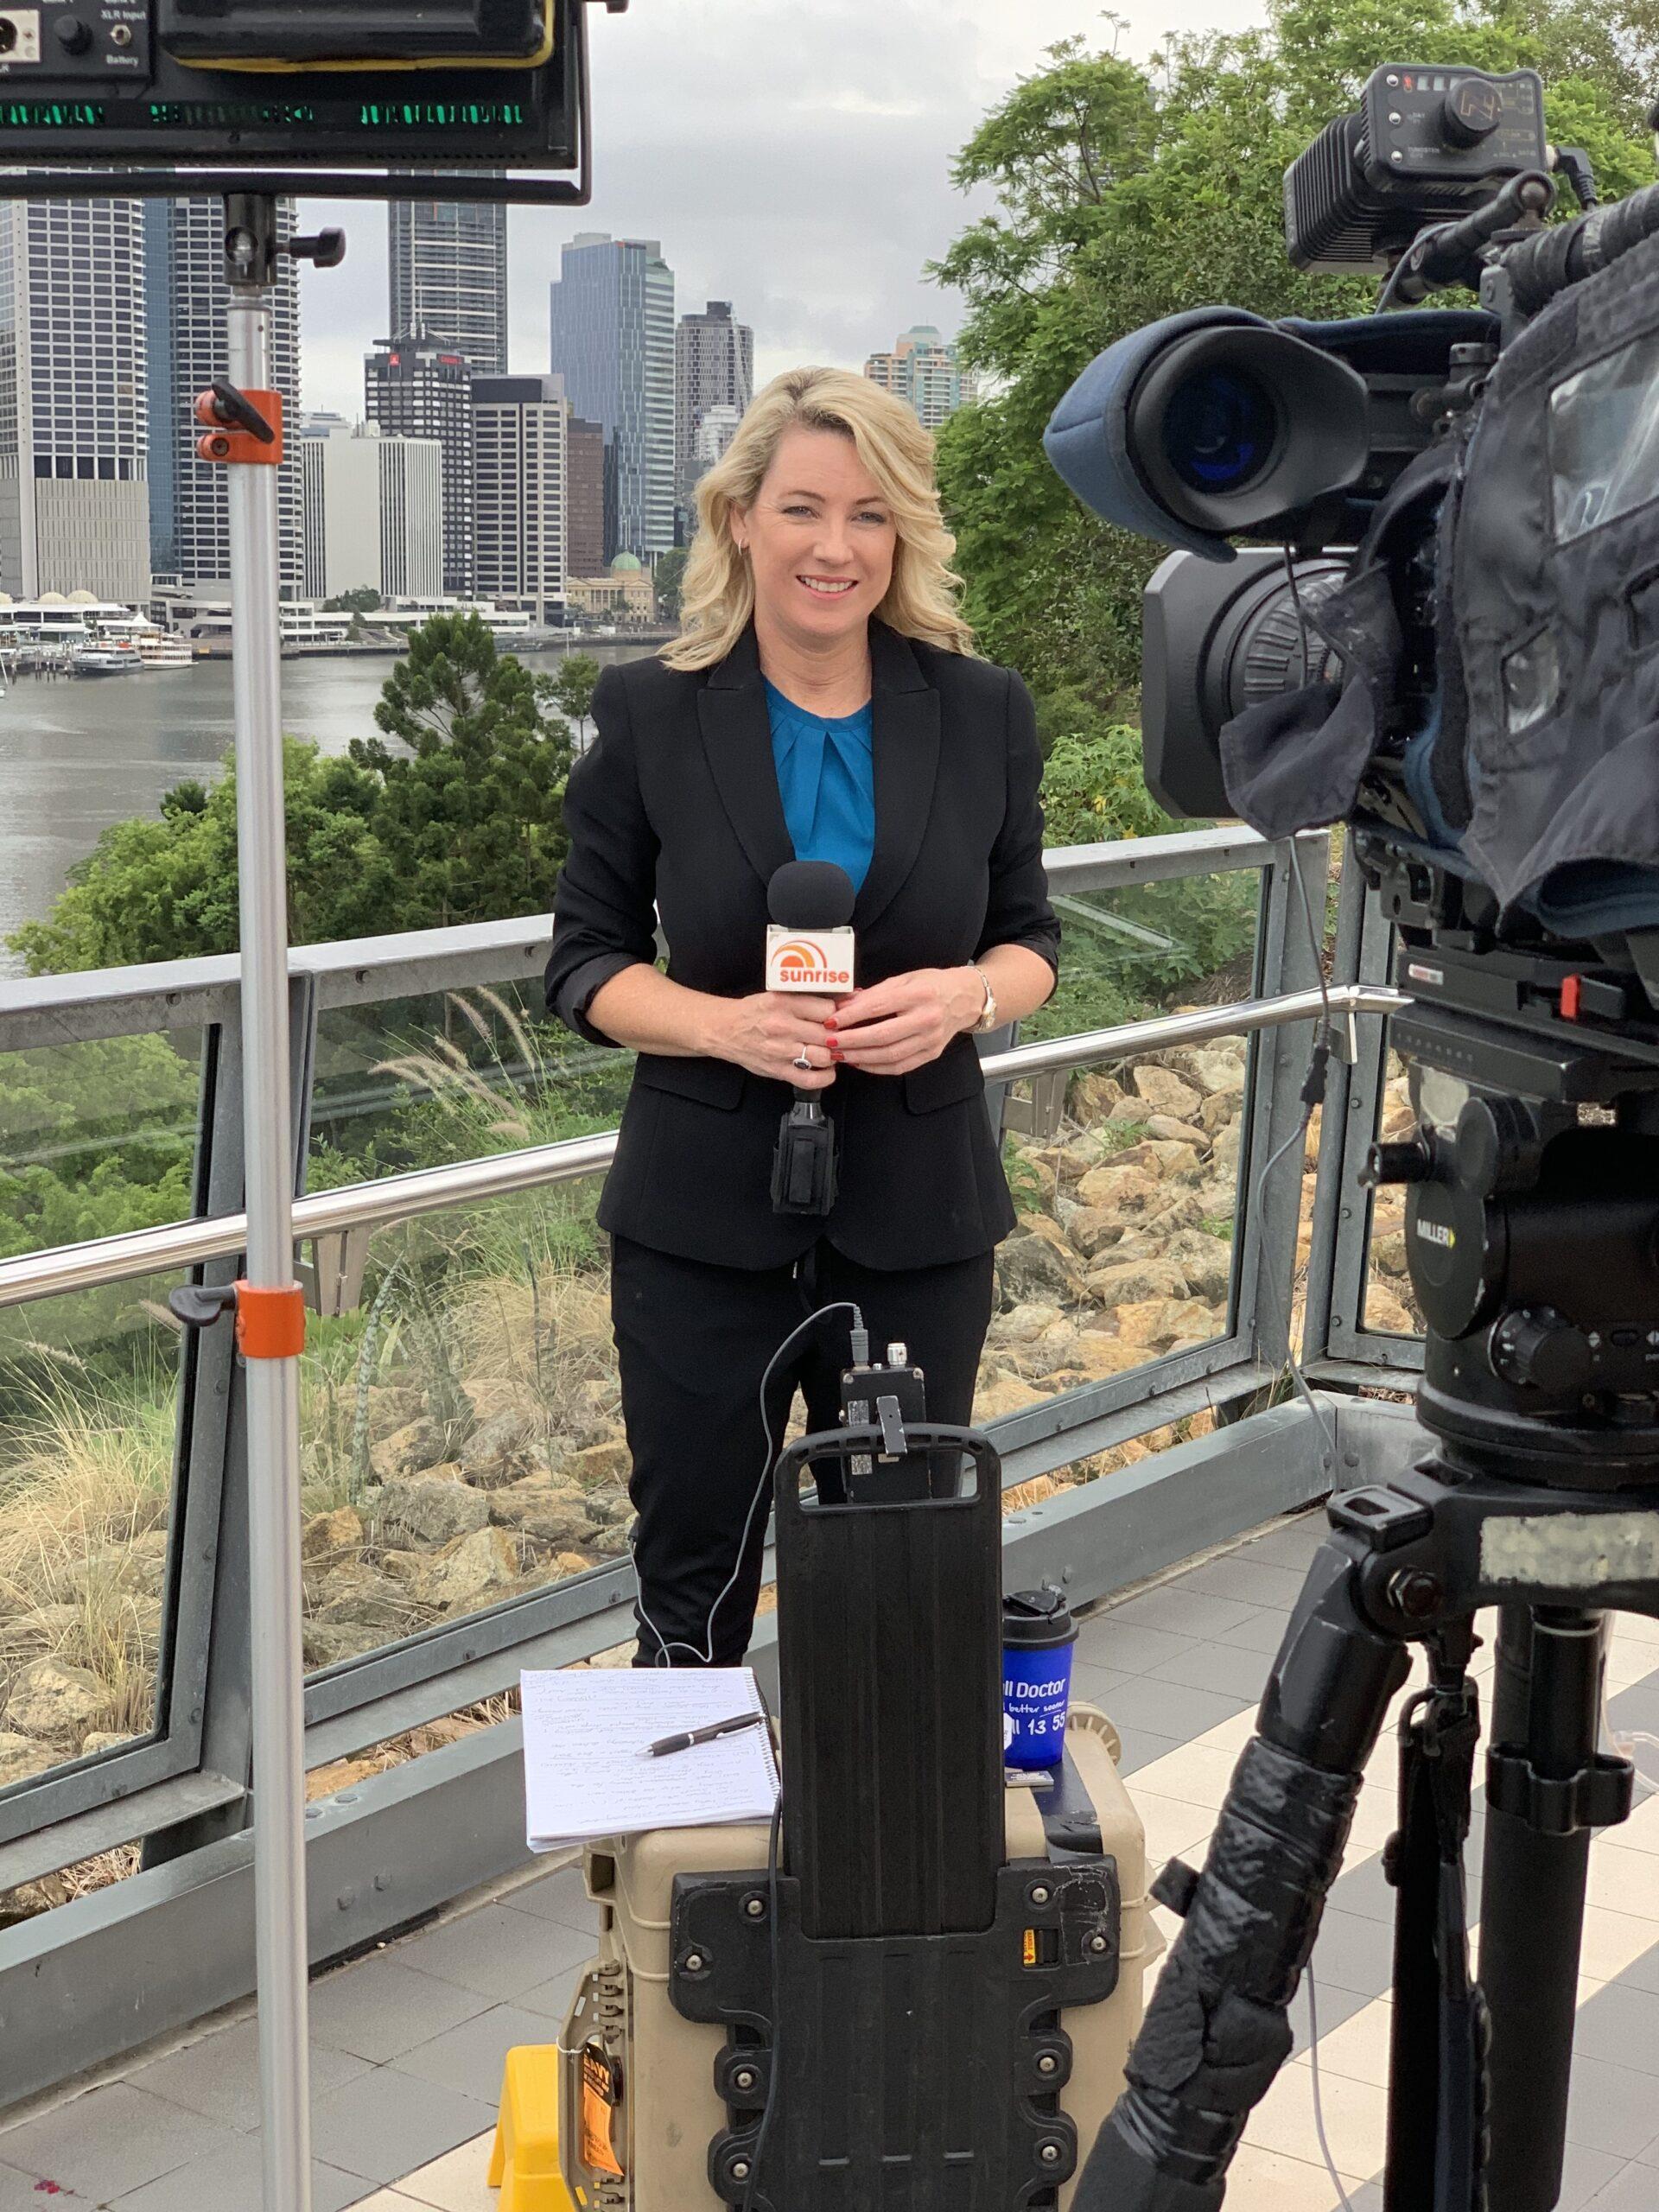 media-checklist-how-do-i-prepare-my-business-for-media-in-2021-